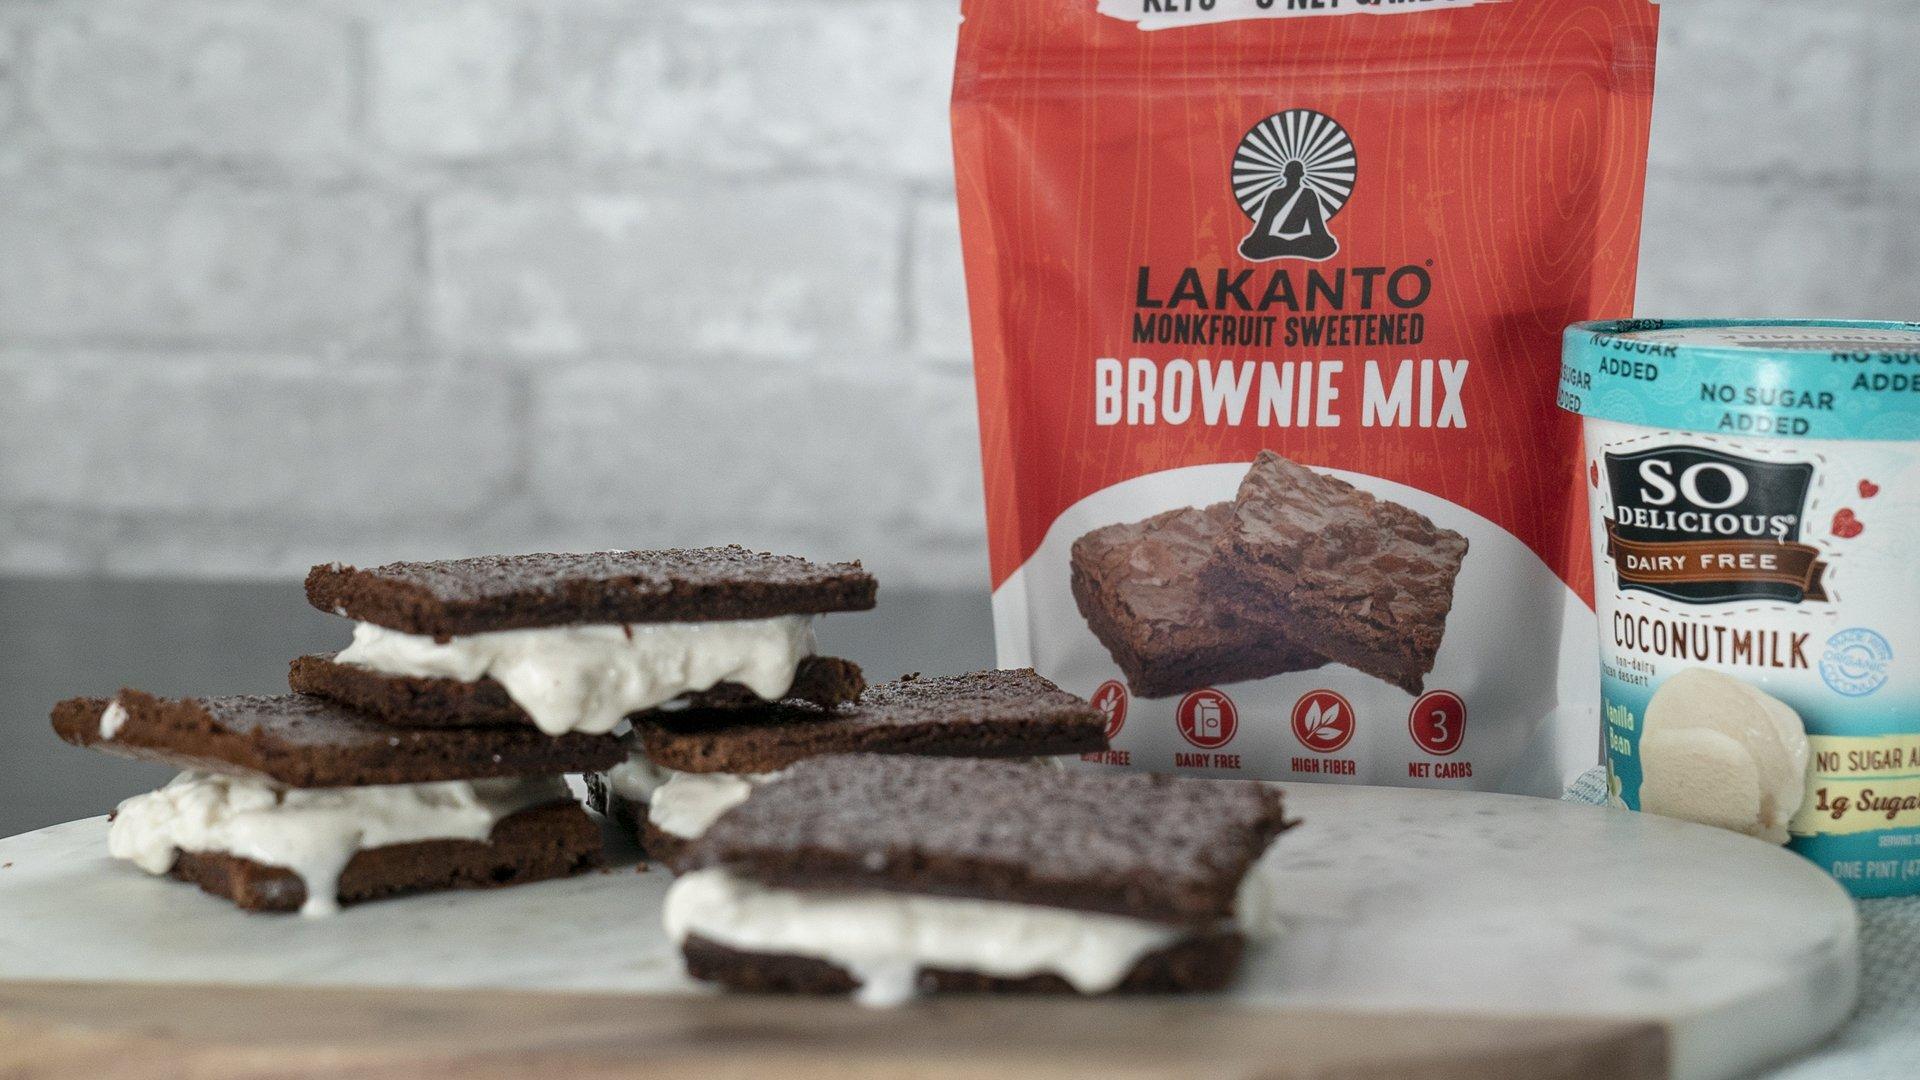 Lakanto Sugar-Free Brownie Mix | 3 net carbs | (Gluten-Free, 16 Servings) by Lakanto (Image #4)